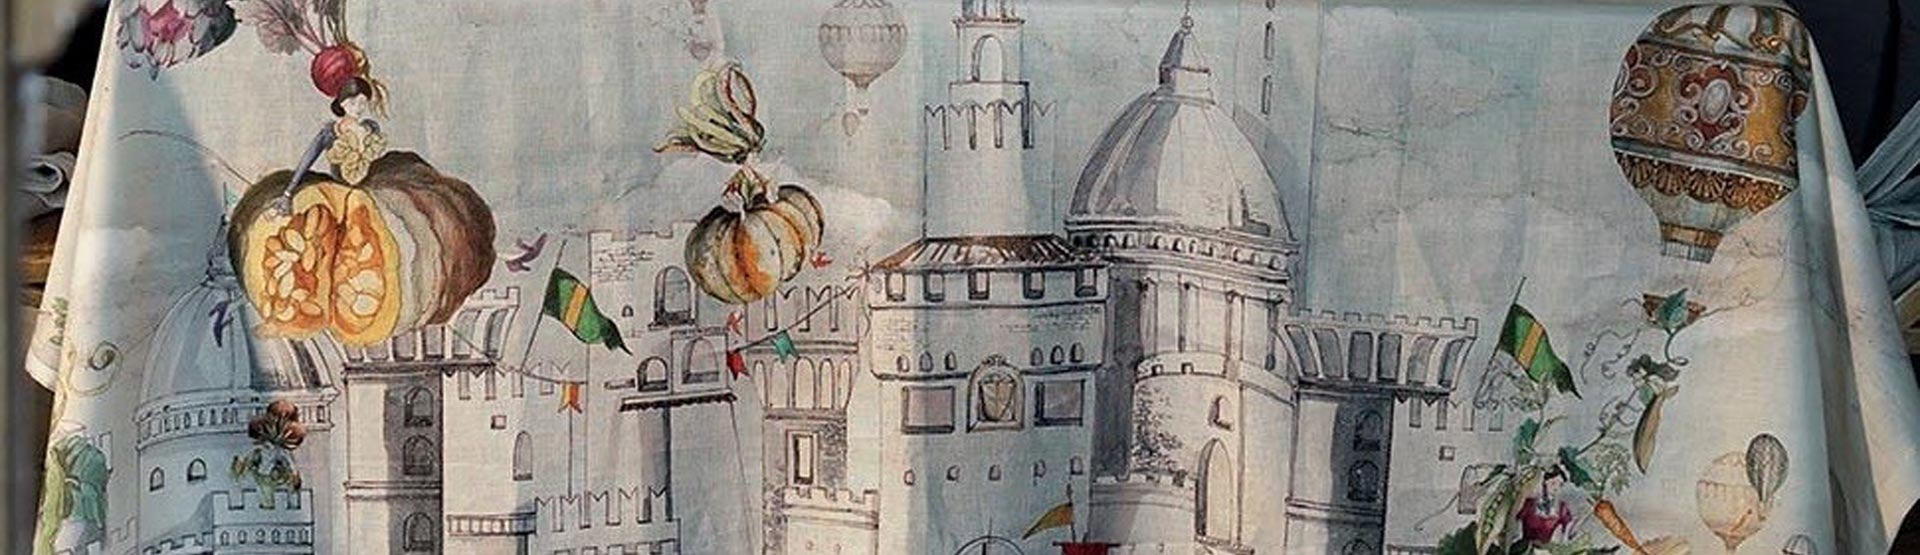 "Linen tablecloth ""Fiaba"" Tesseitura Toscana Telerie"